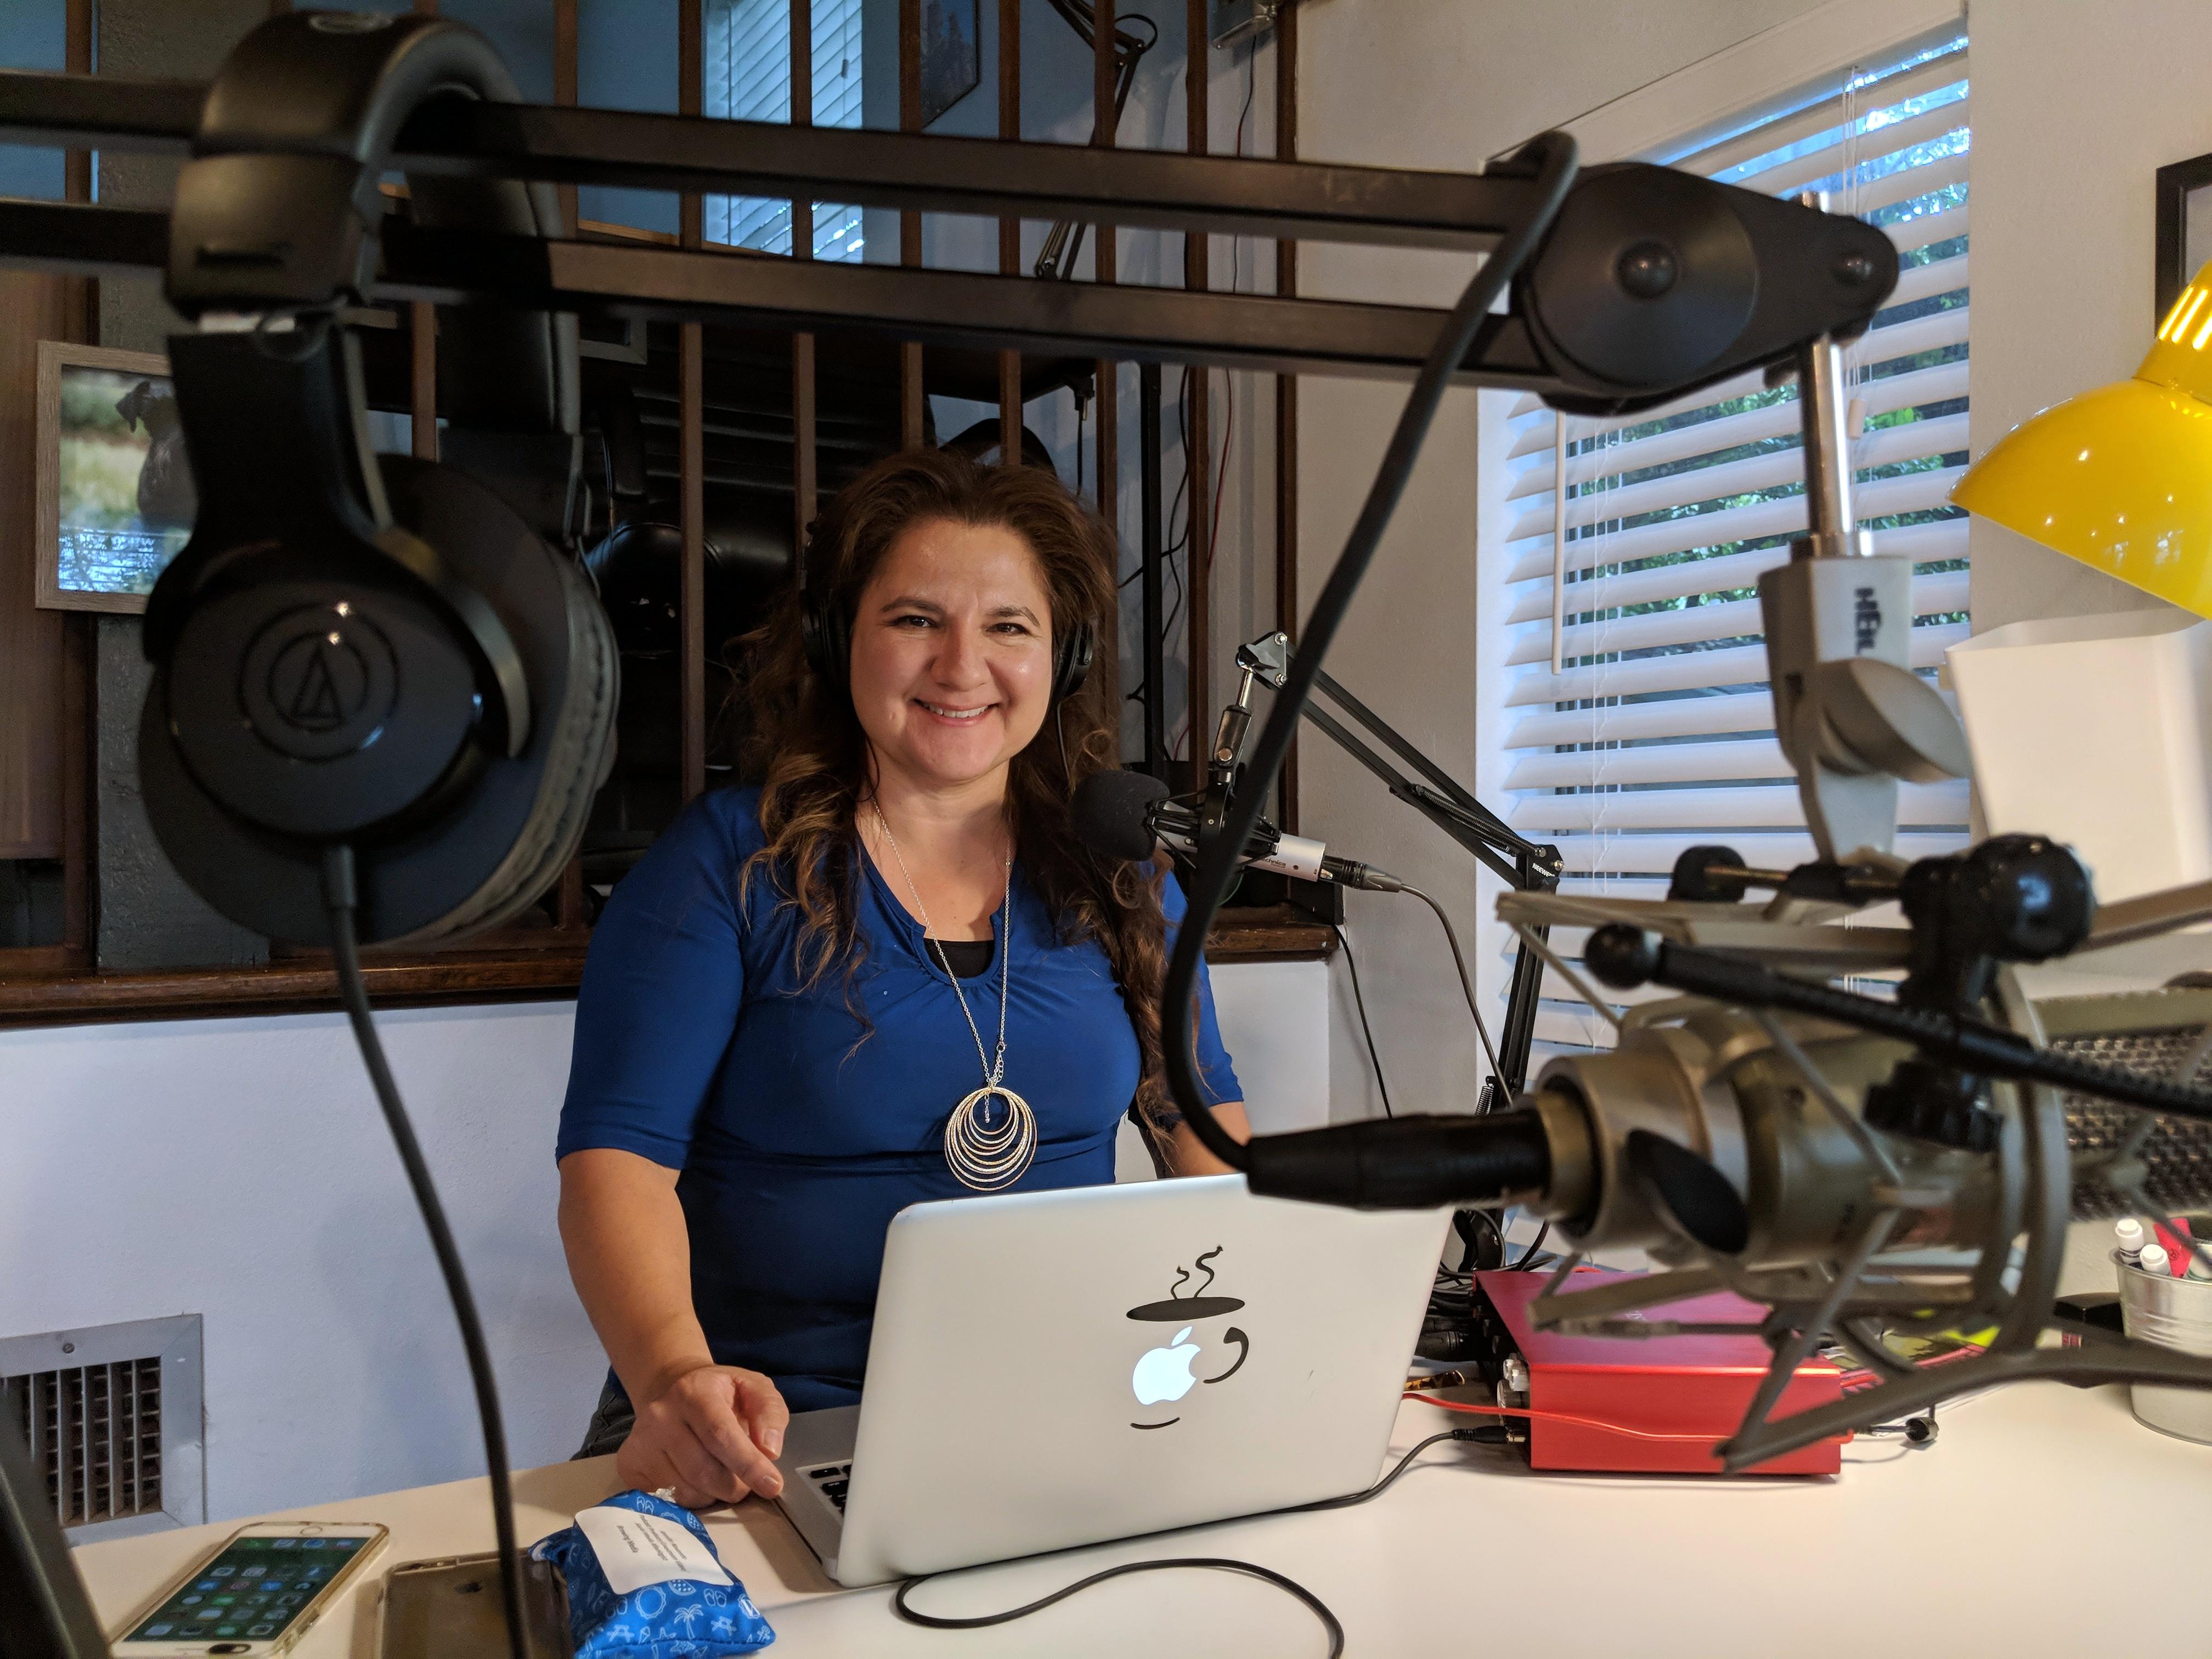 Want to Launch a Podcast? NaPodPoMo Founder Jennifer Navarrete Says Do It